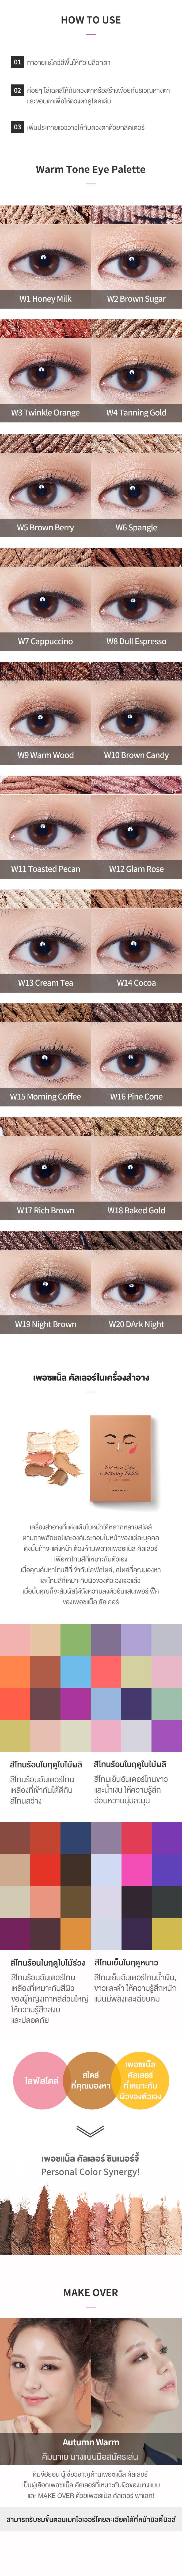 Personal Color Palette Warm Tone Eyes_02